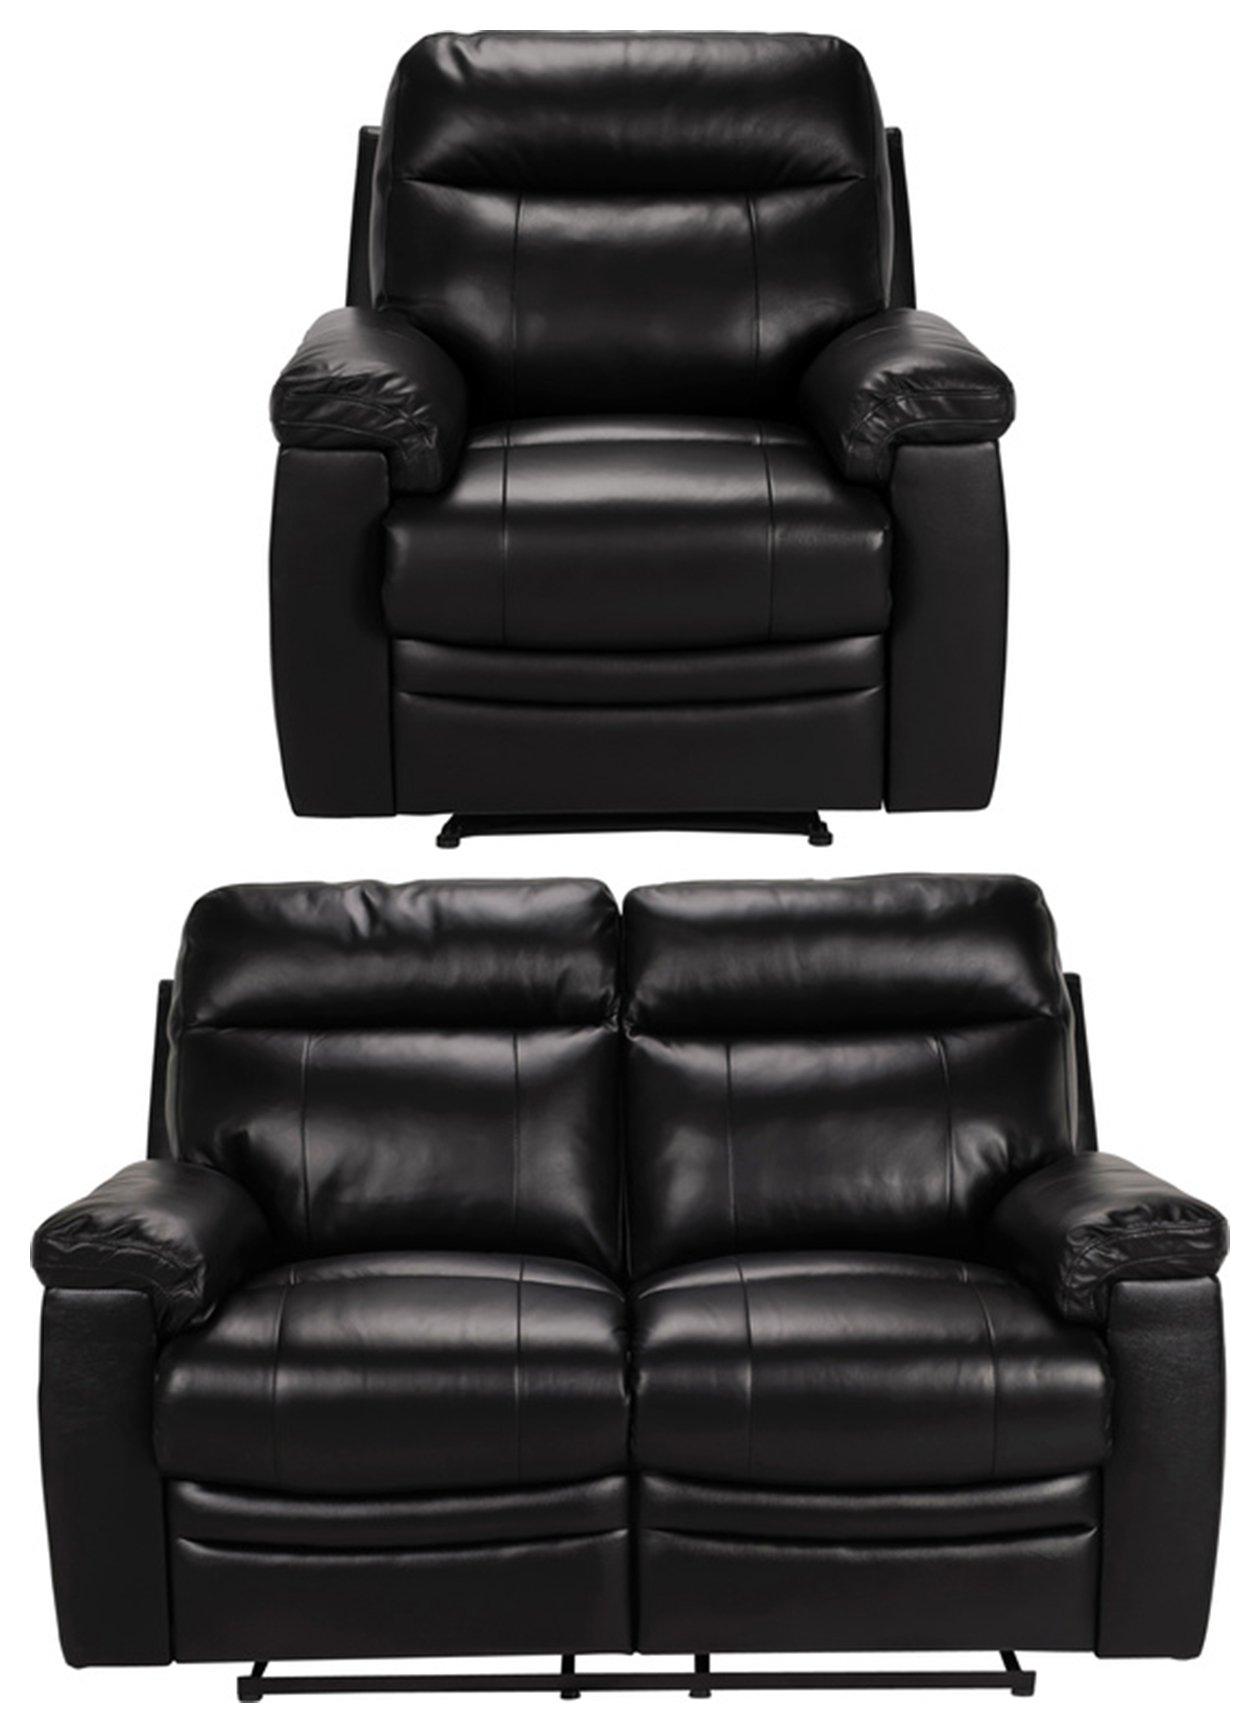 Buy Argos Home Paolo Chair 2 Seater Manual Recline Sofa Black